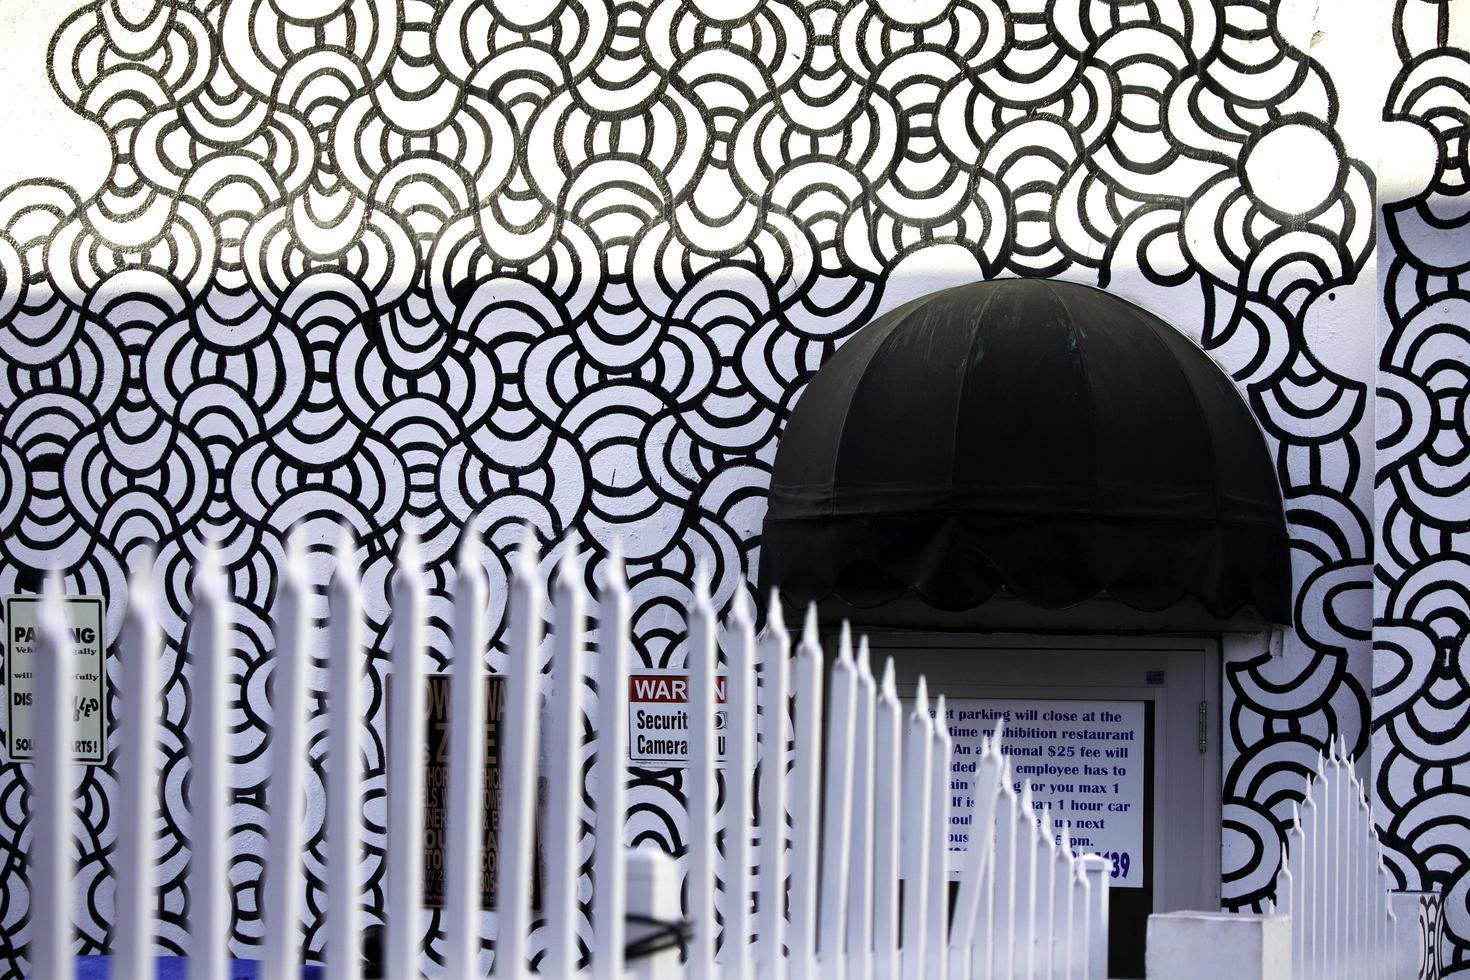 Miami, Florida, 2020 - Black and white design on building photo